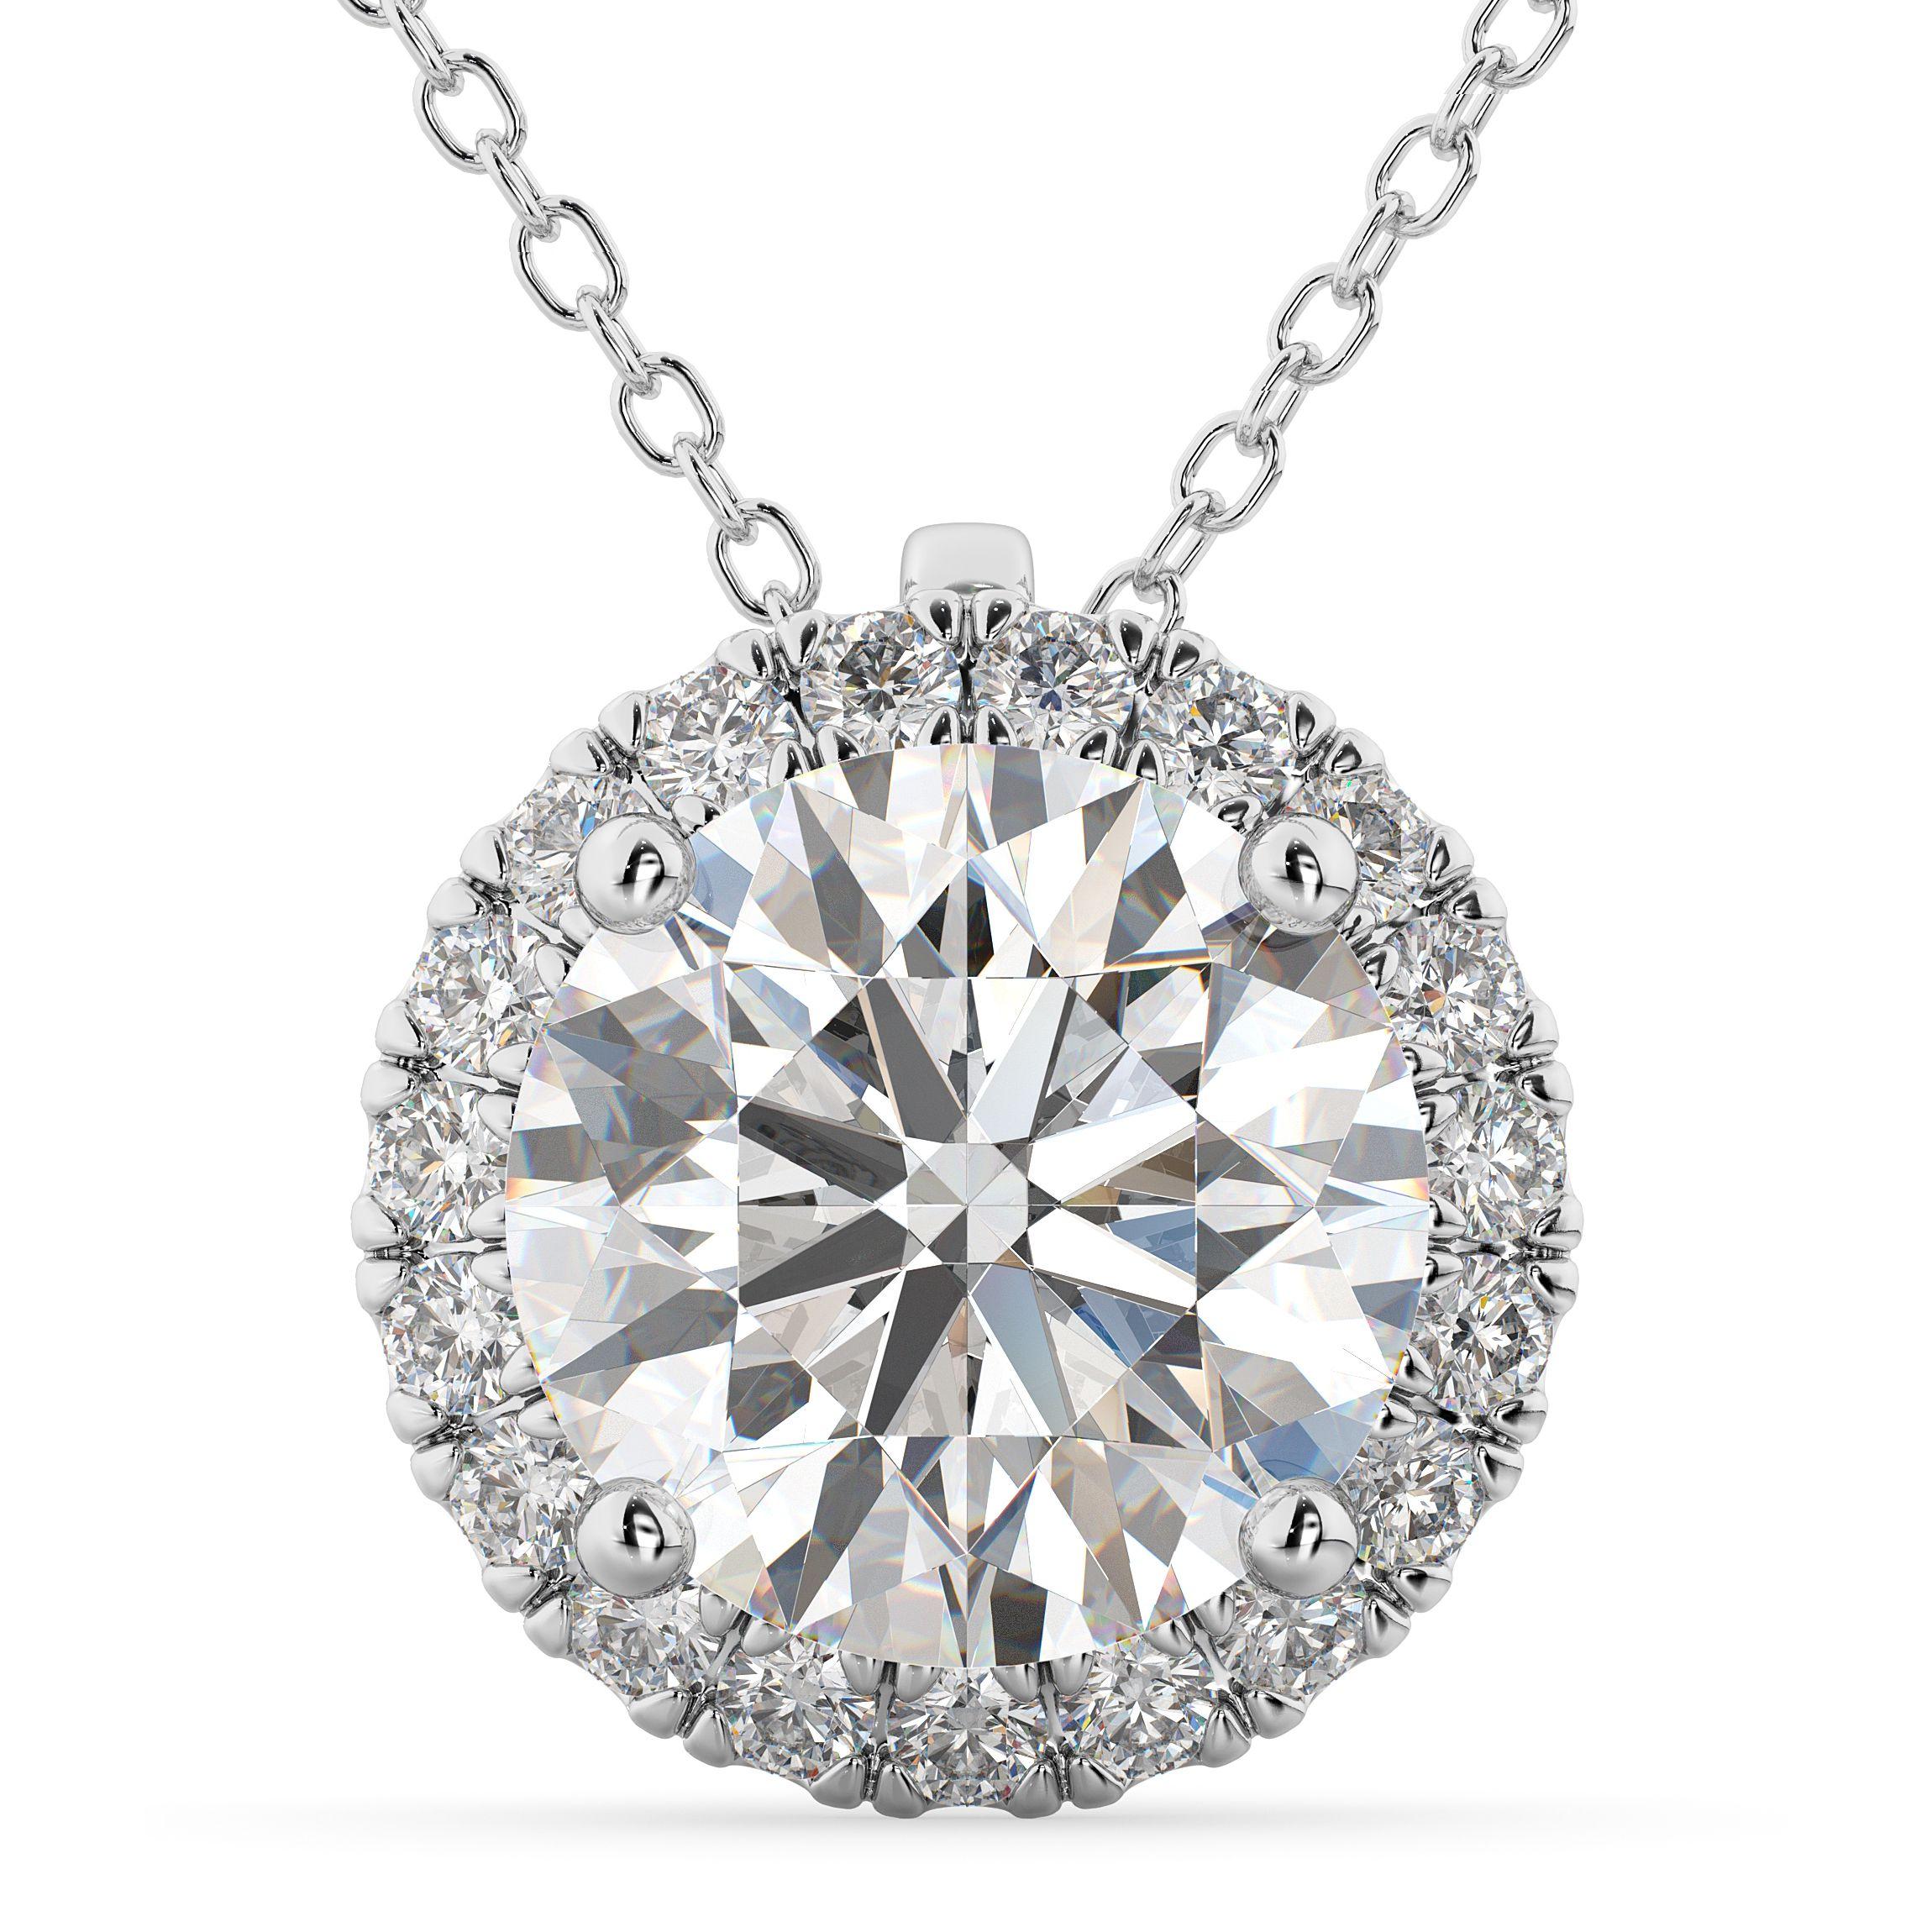 44b291ec68336 Halo Round Diamond Pendant Necklace 14k White Gold (2.29ct) | Drop ...